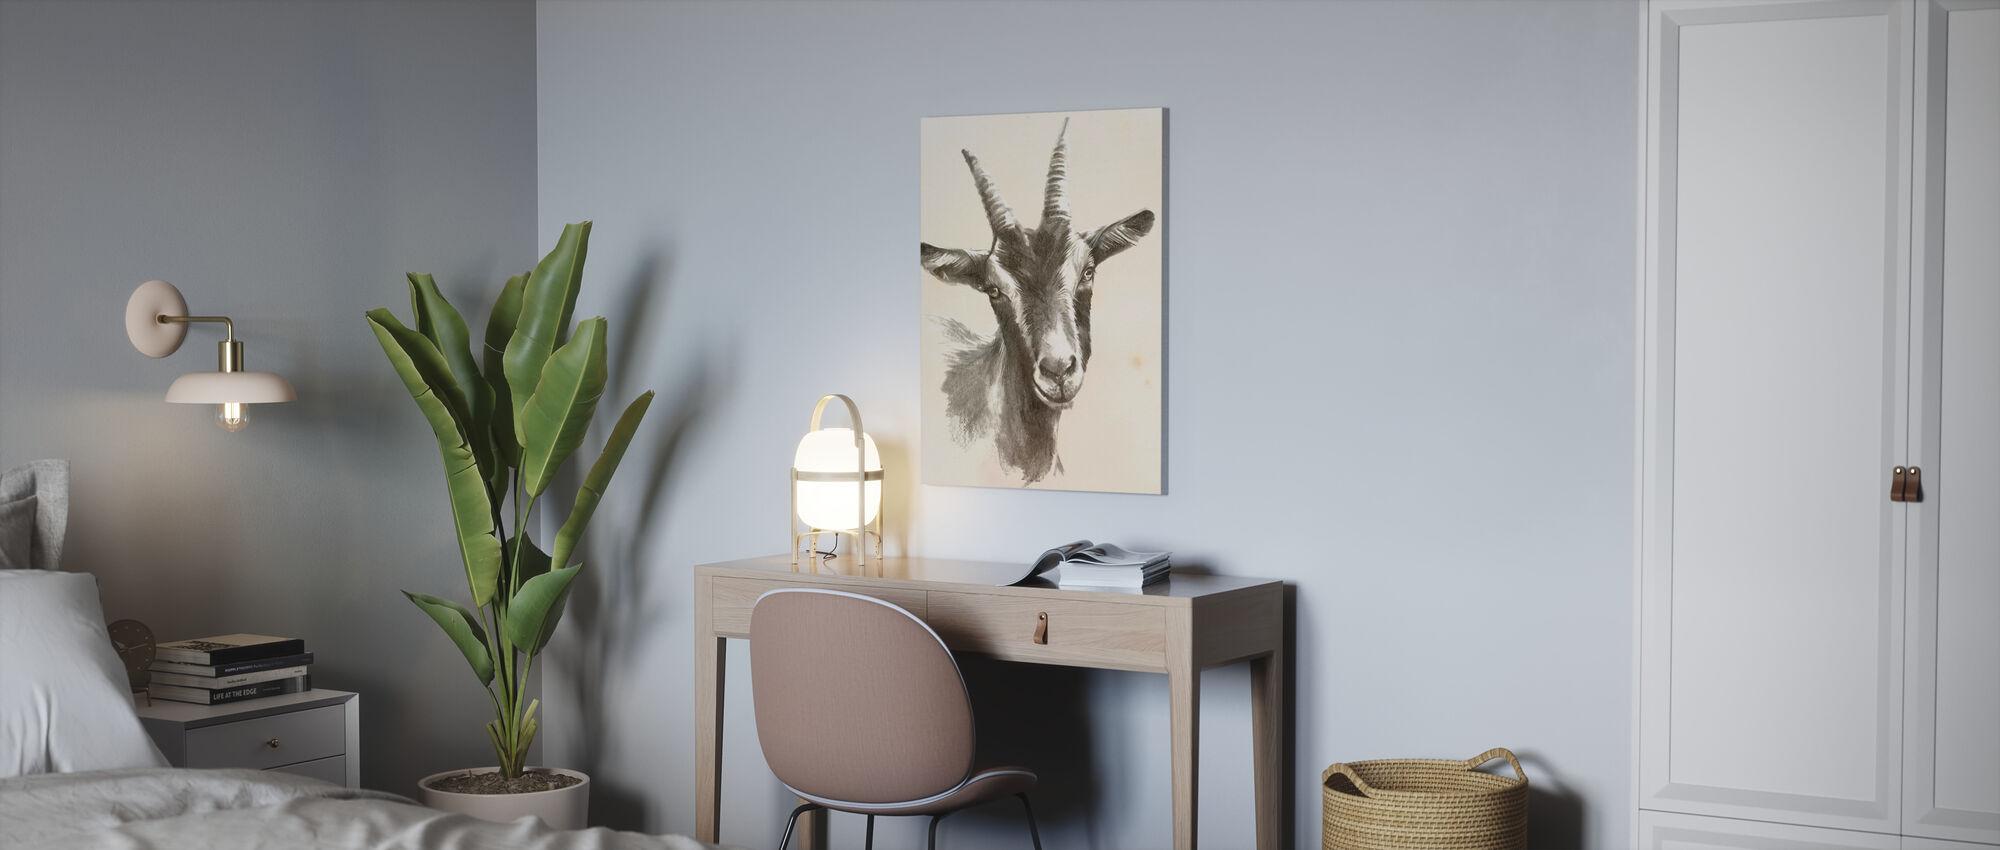 Sketched Farm Portraits II - Canvas print - Office